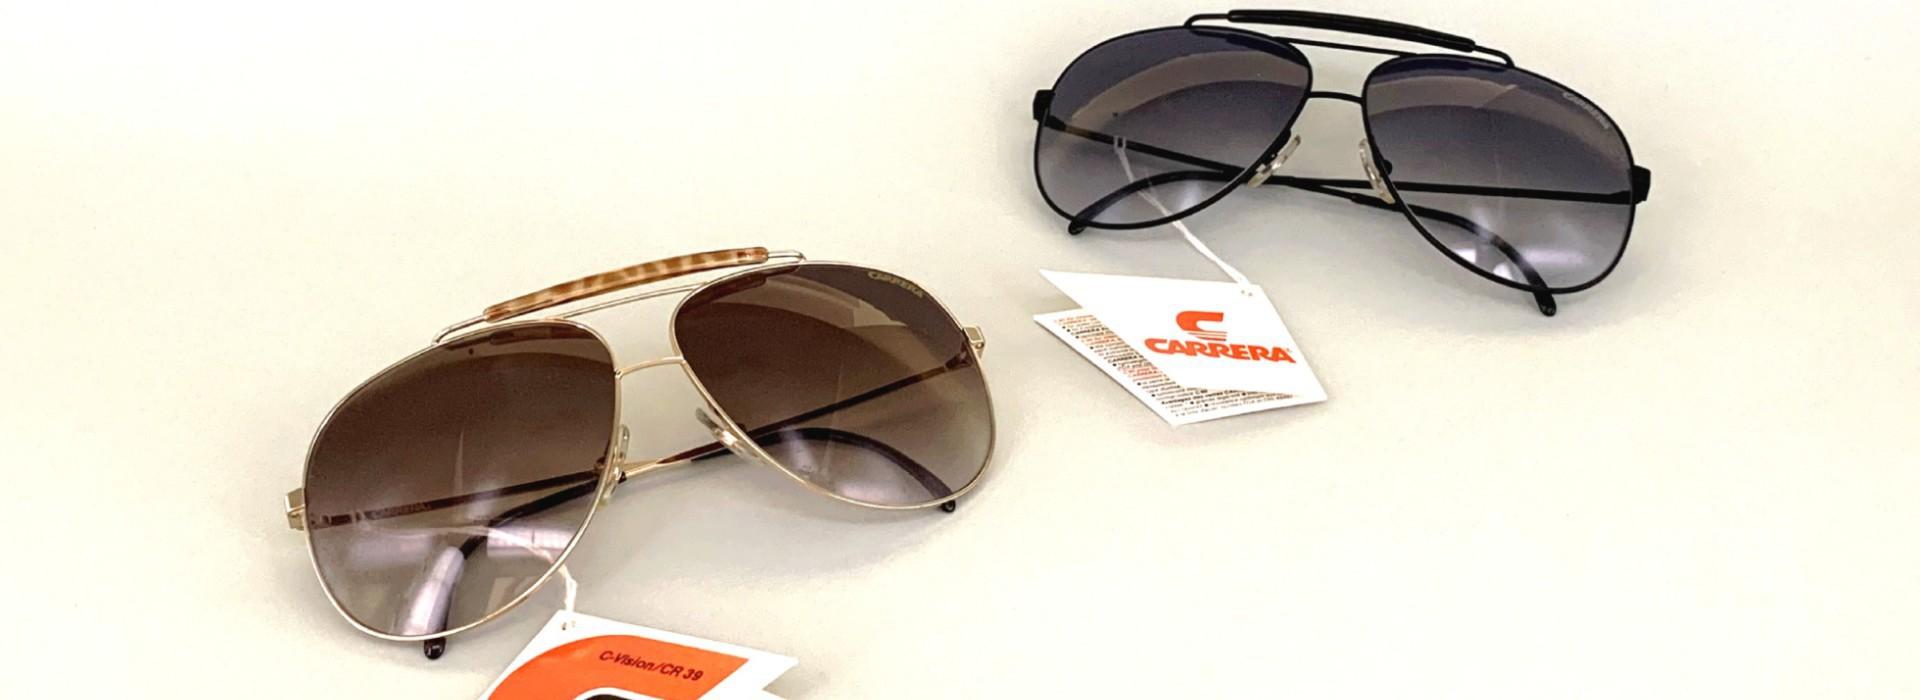 Vintage Carrera sunglasses for sale